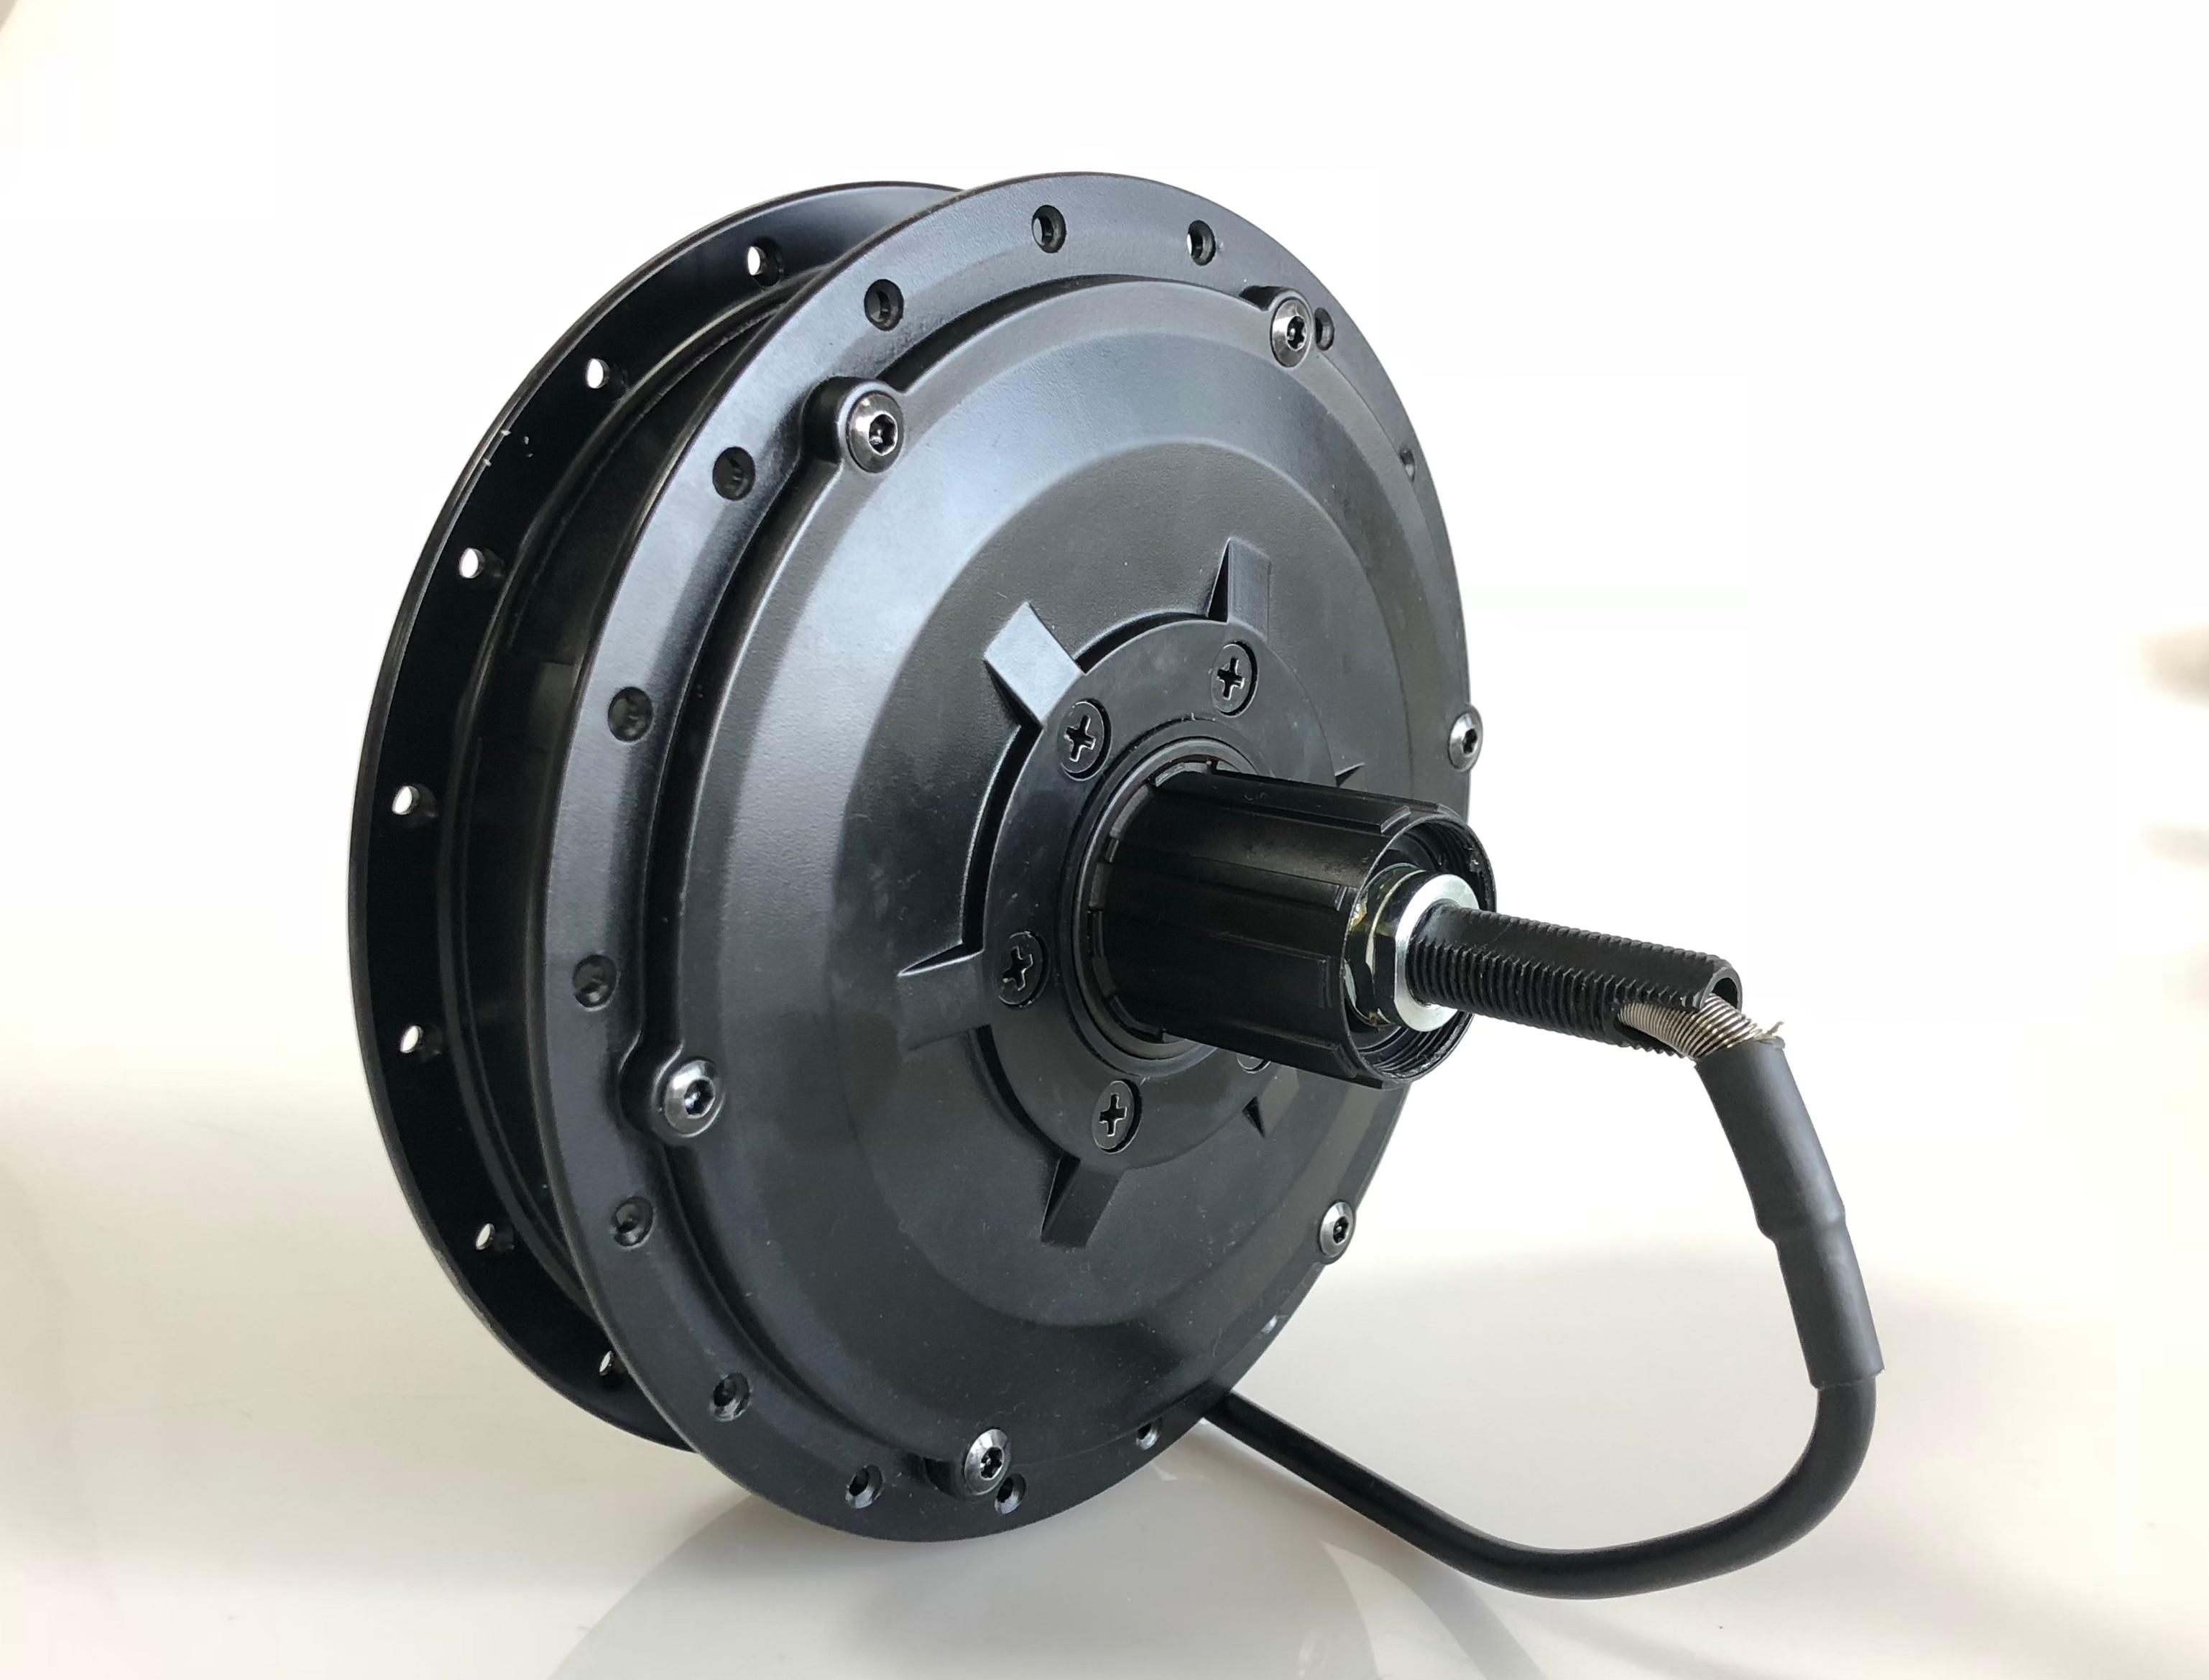 Bafang RM G040.500.DC geared hub motor 500W electric bike CST motor cassette rear drive disc brake black